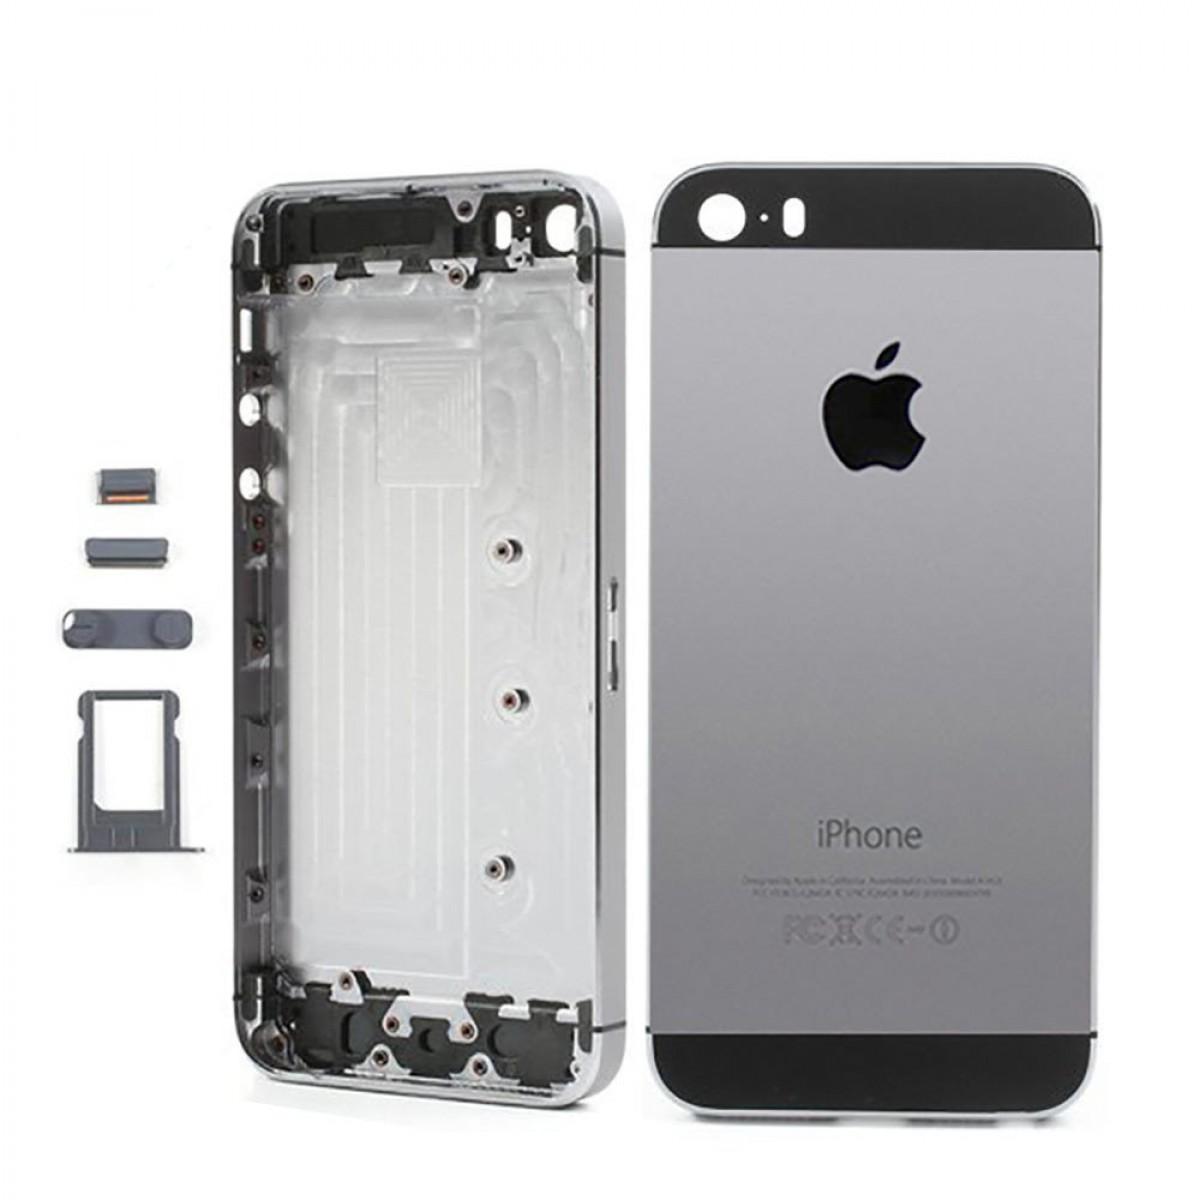 замена задней крышки iPhone 5s